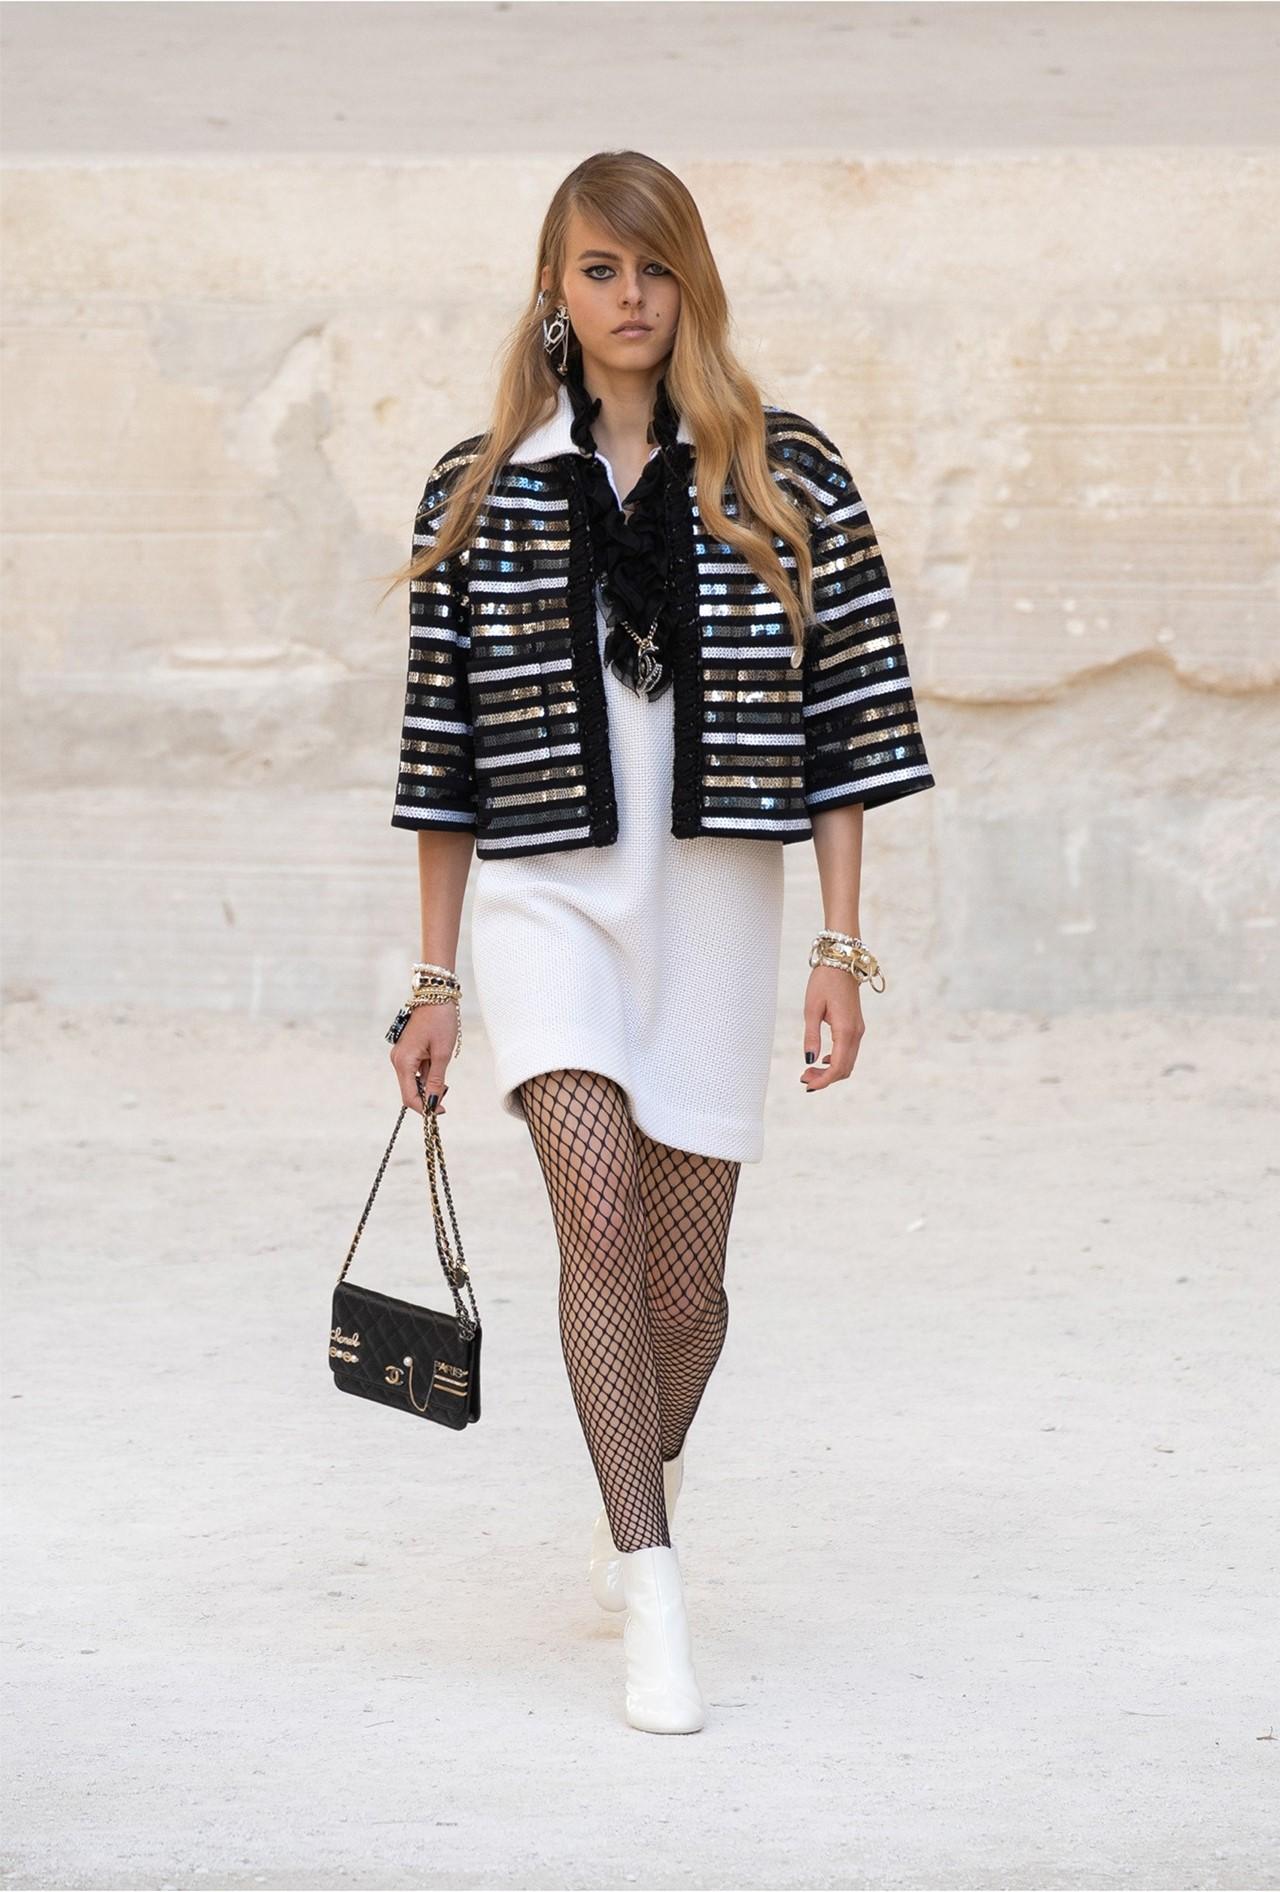 Chanel_Cruise_2022_Fashionela (32)